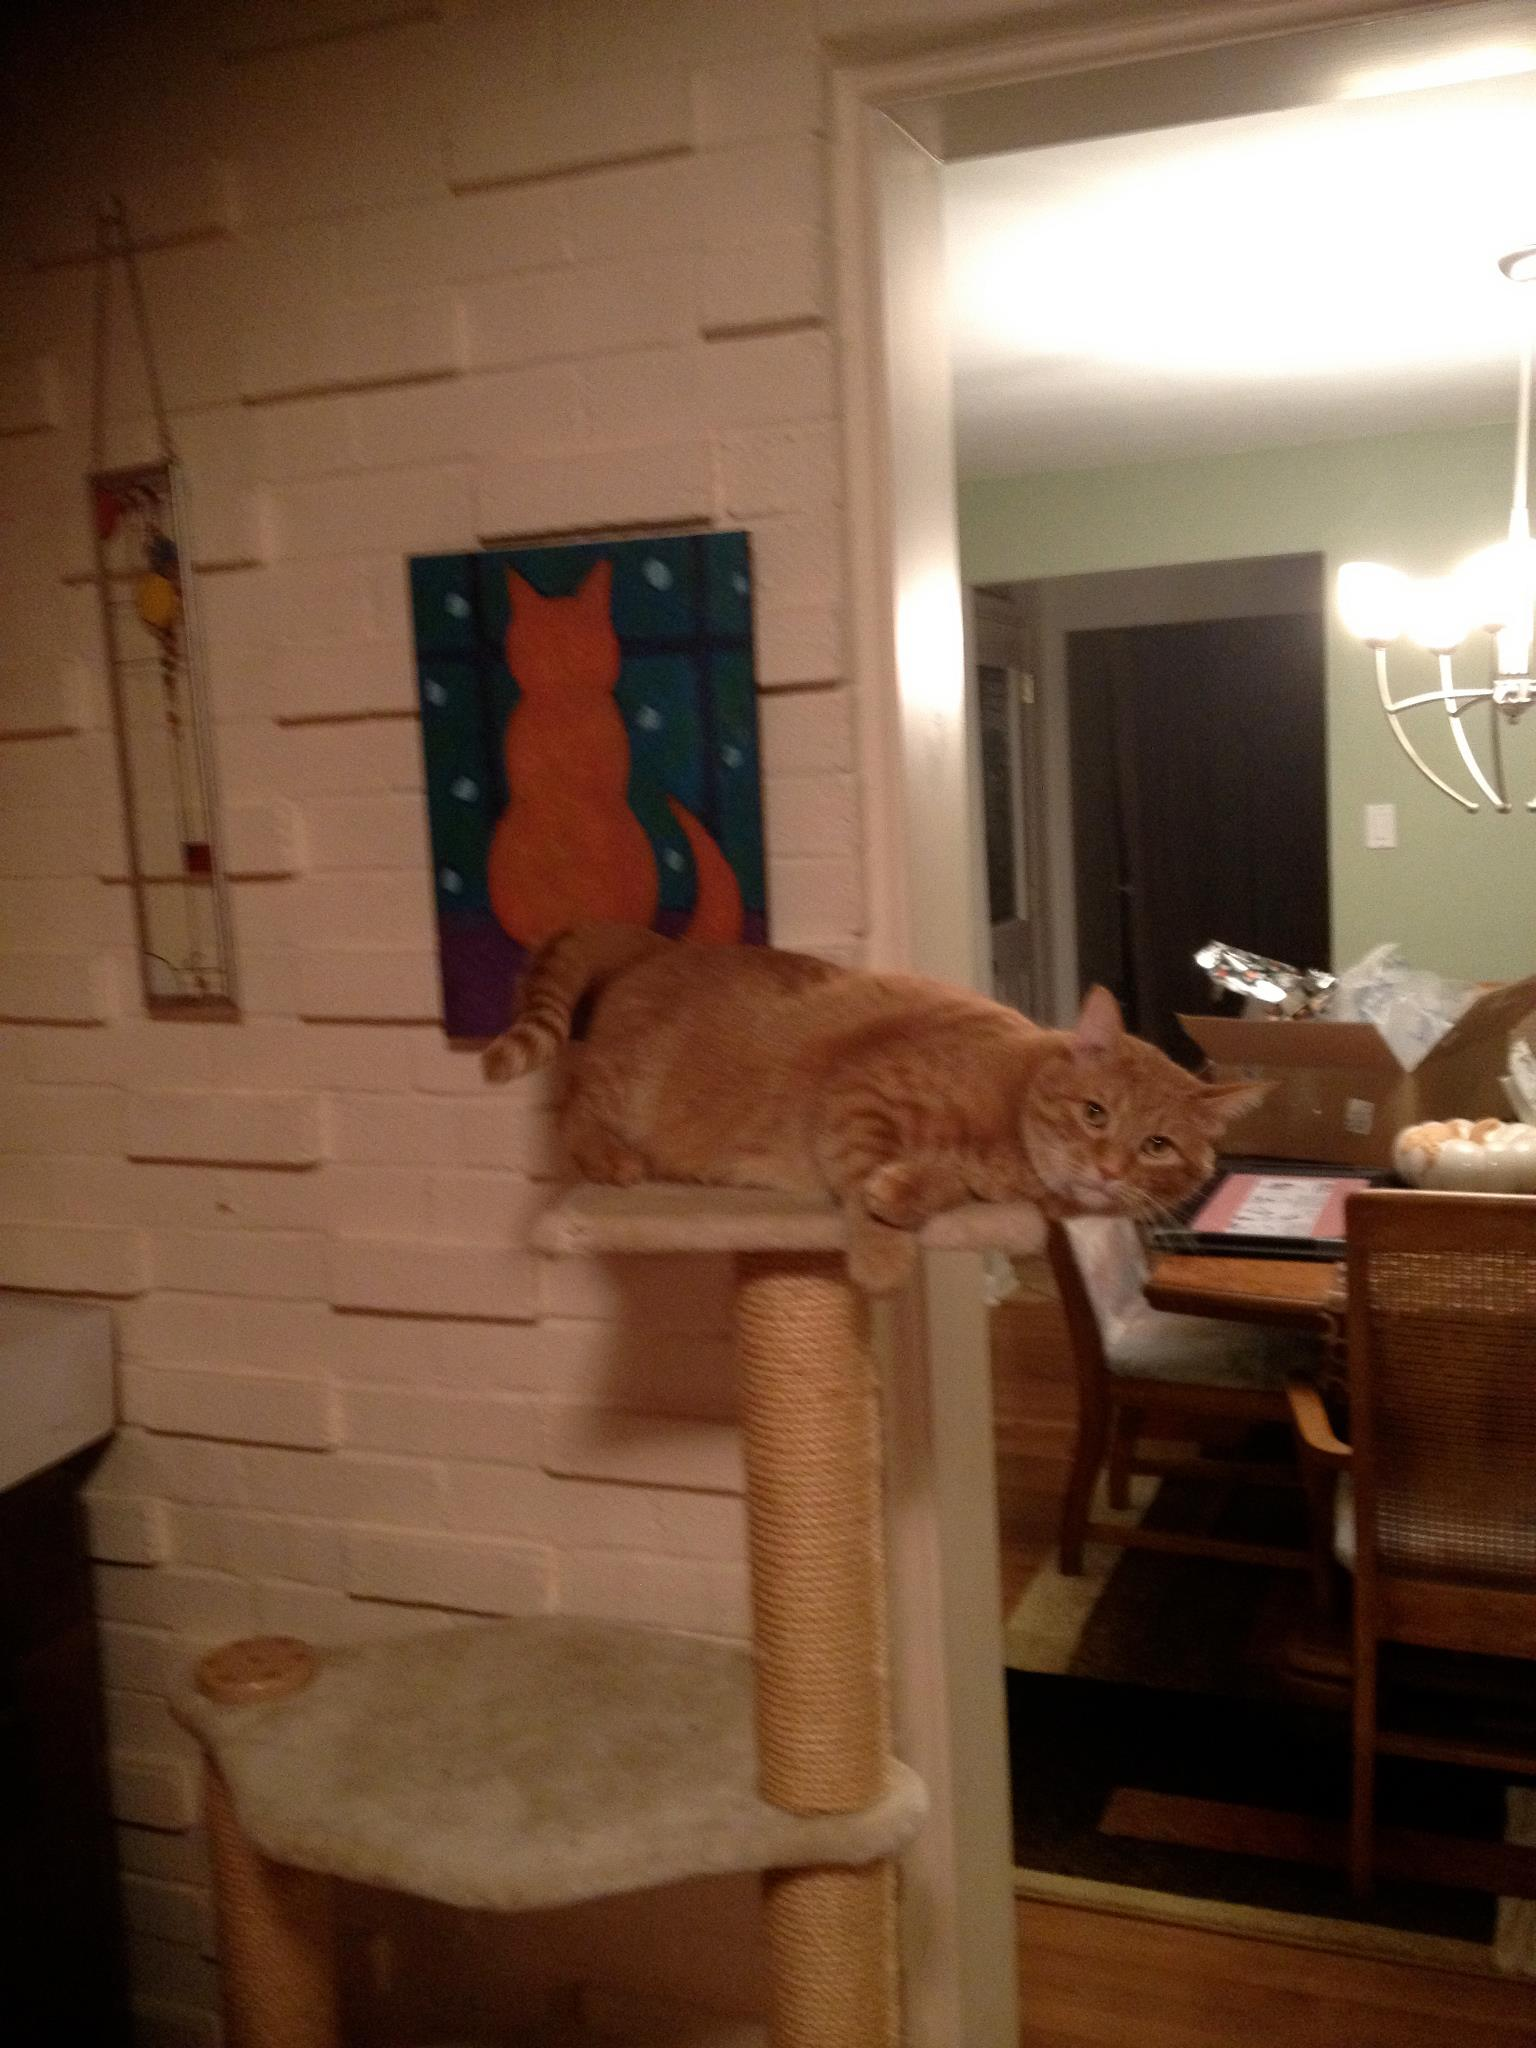 Cat imitating art